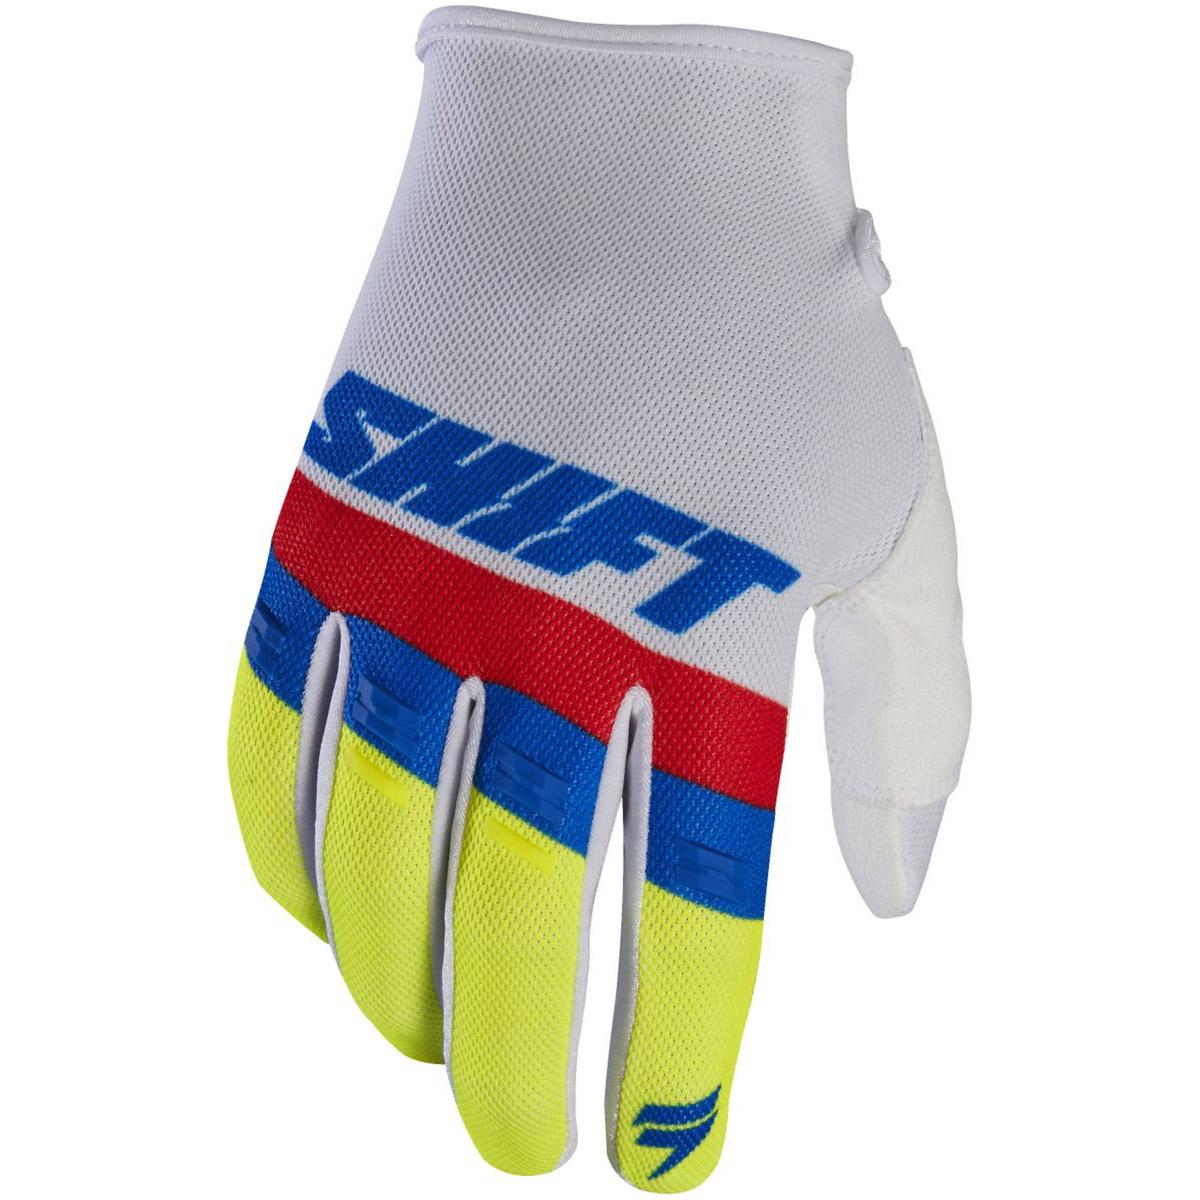 Shift - 2017 White Label Air перчатки, белые